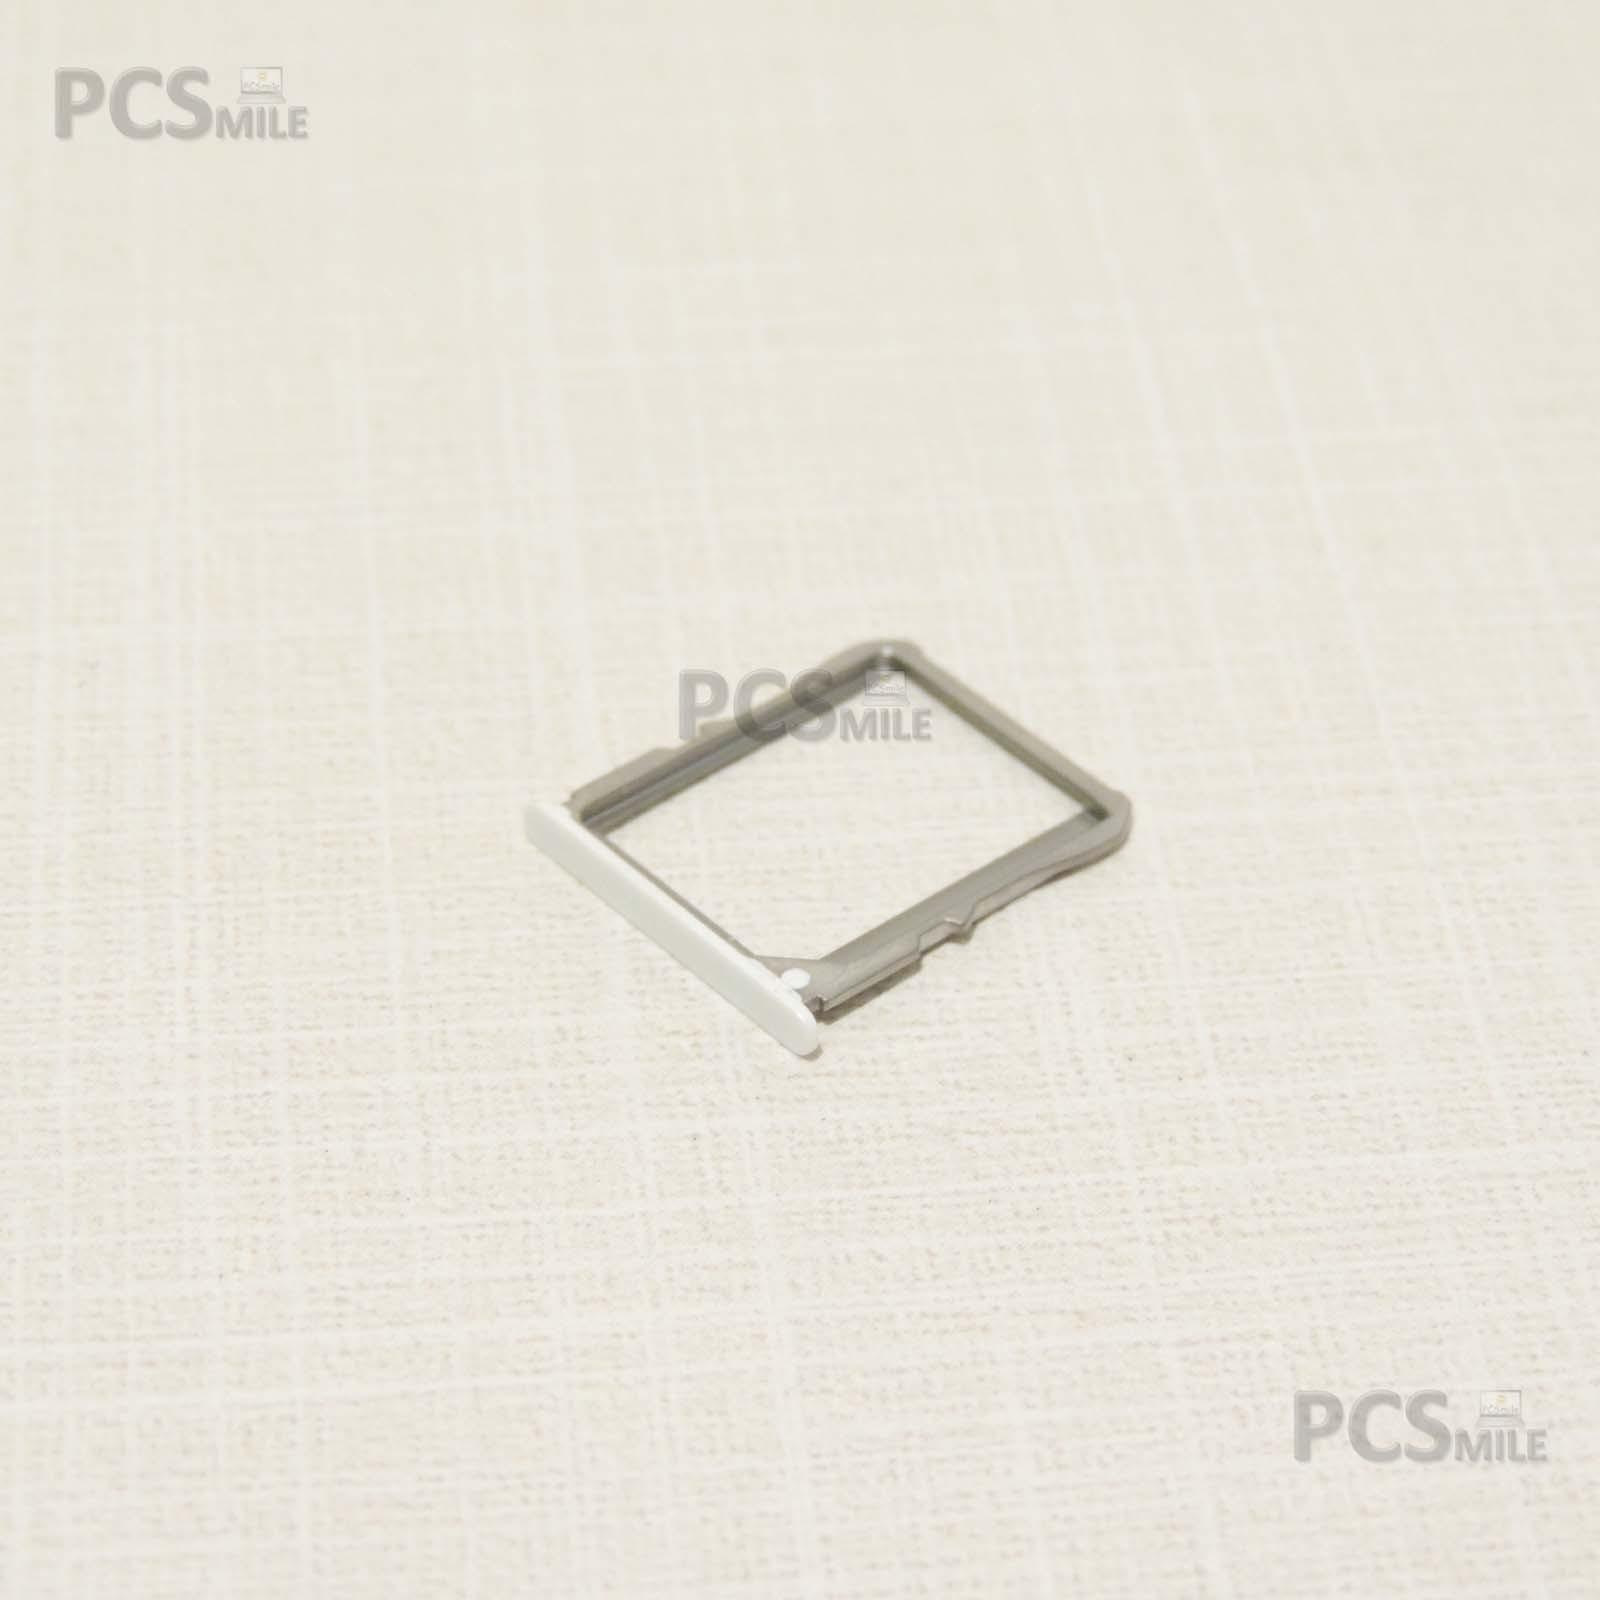 Carrellino Scheda SIM Nexus 4 LG-E960 slitta laterale SIM Black originale